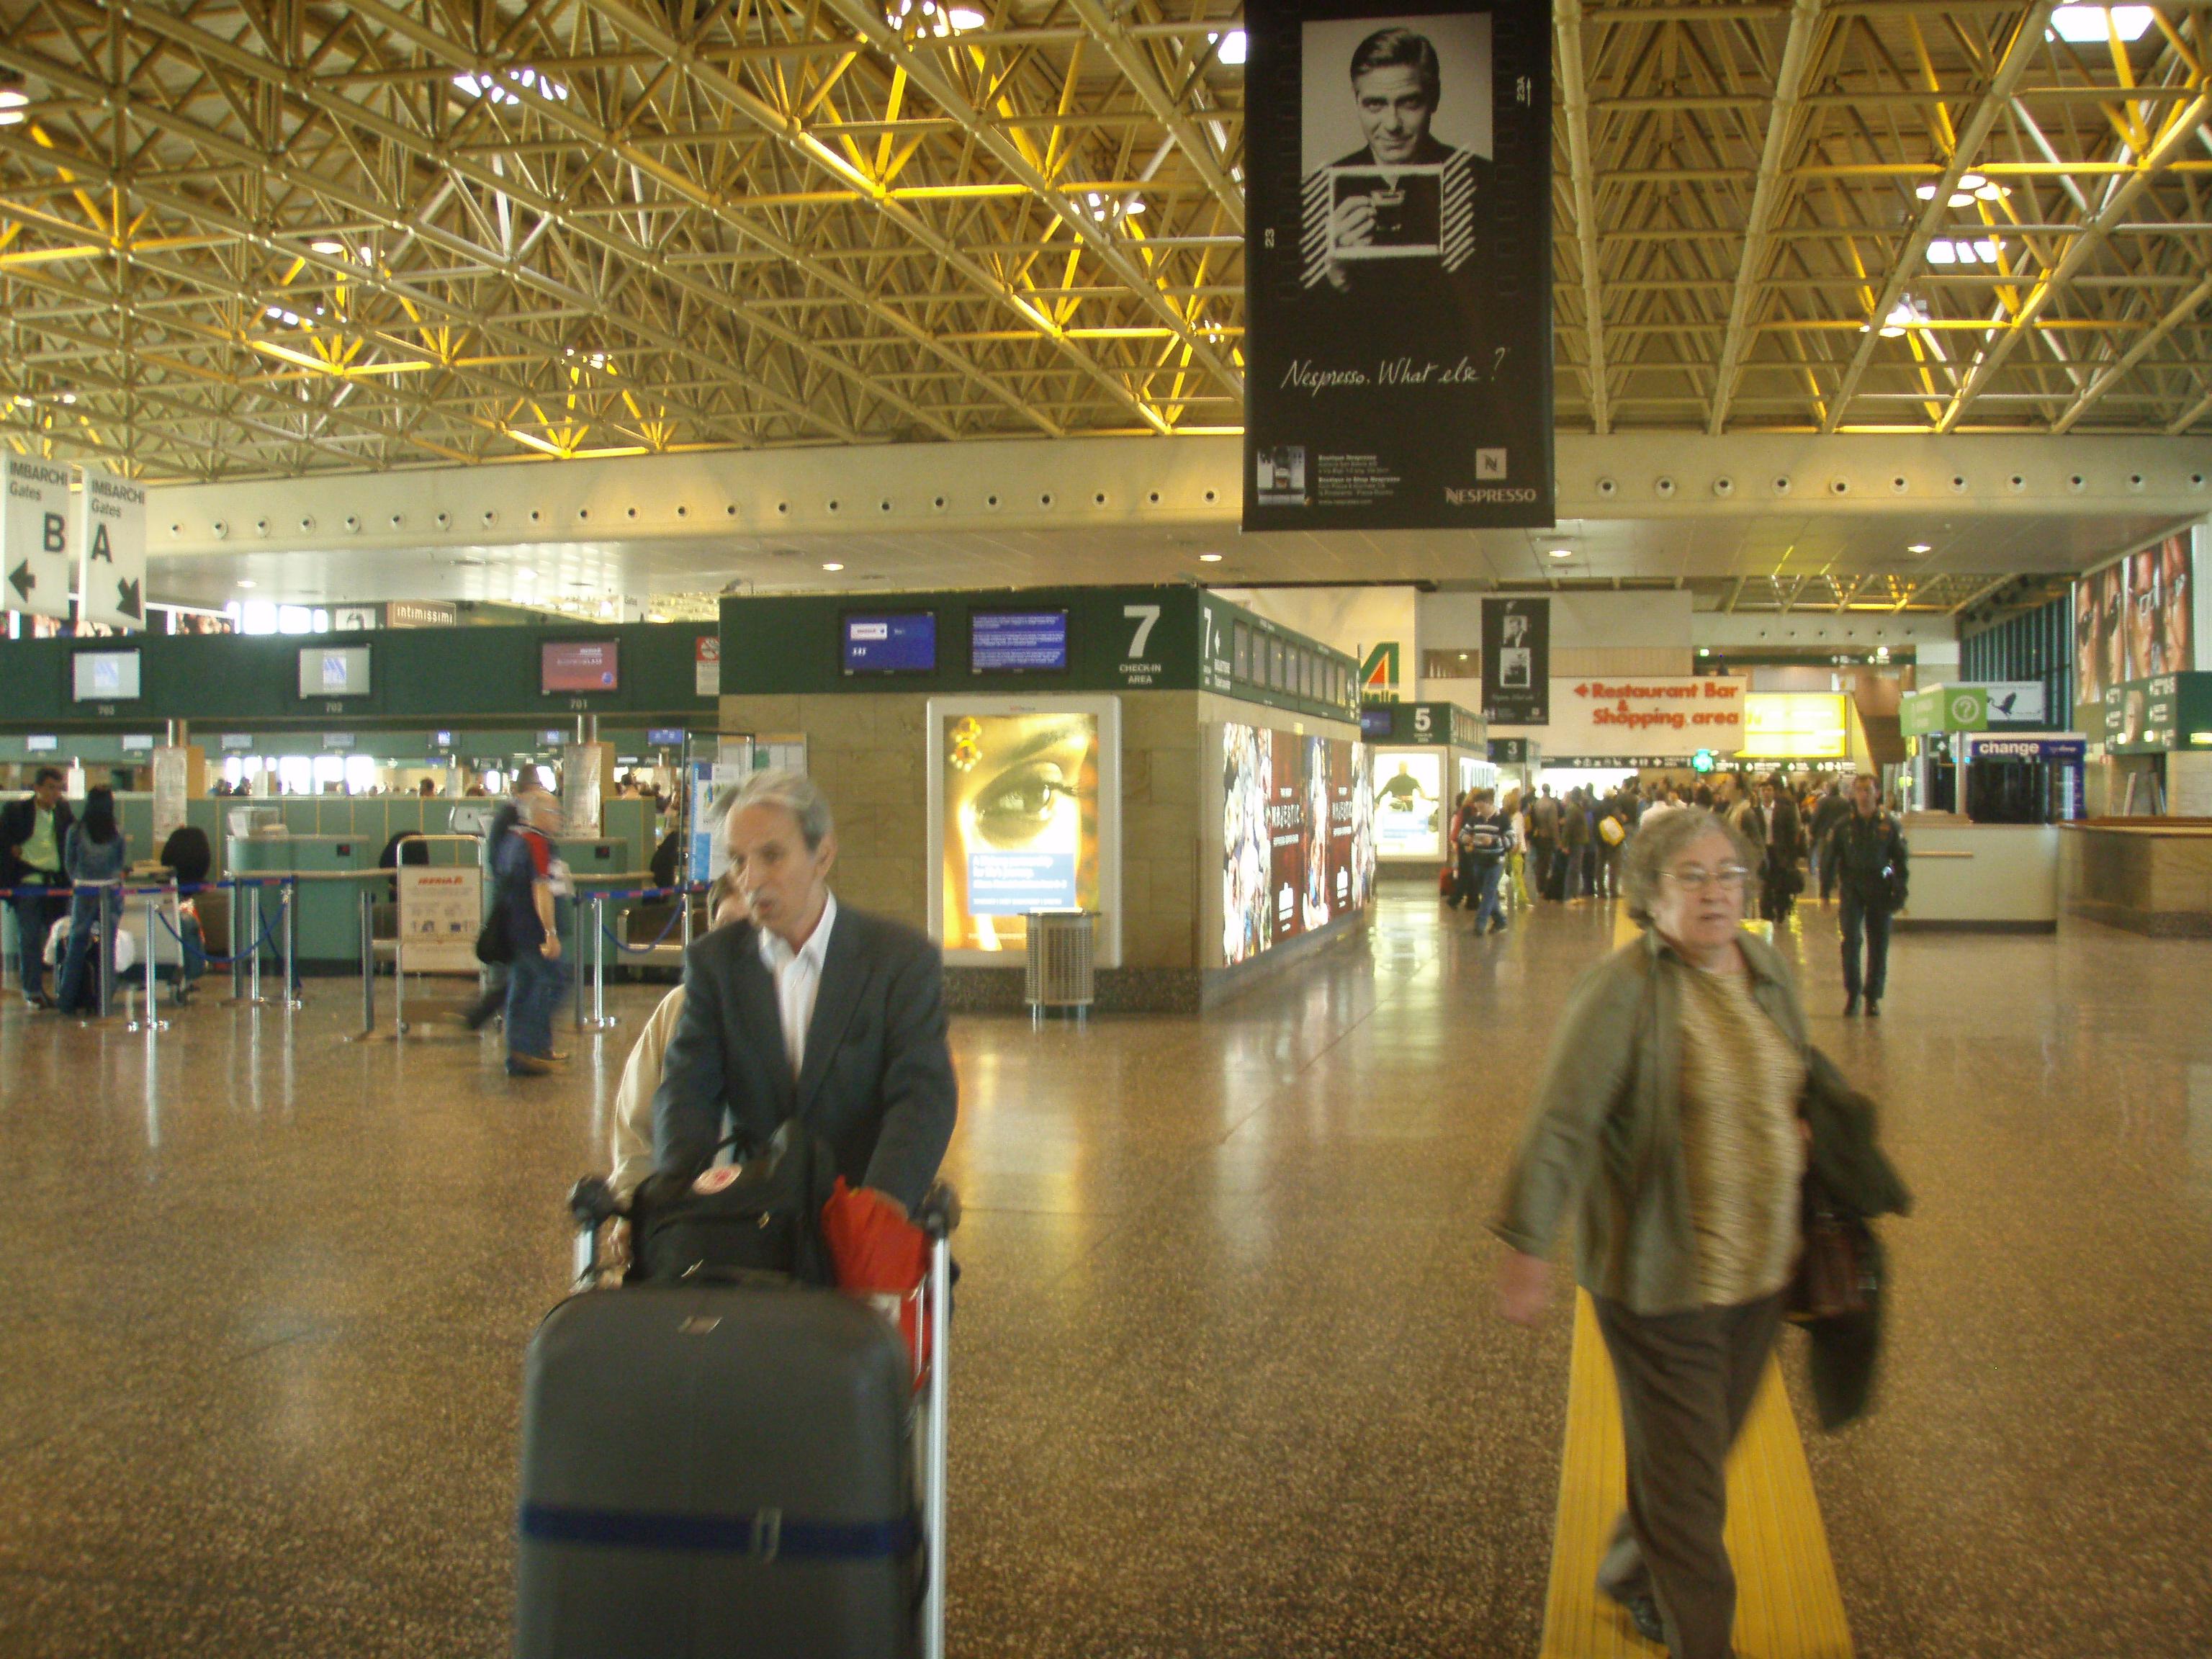 File:Malpensa Airport terminal.jpg - Wikipedia